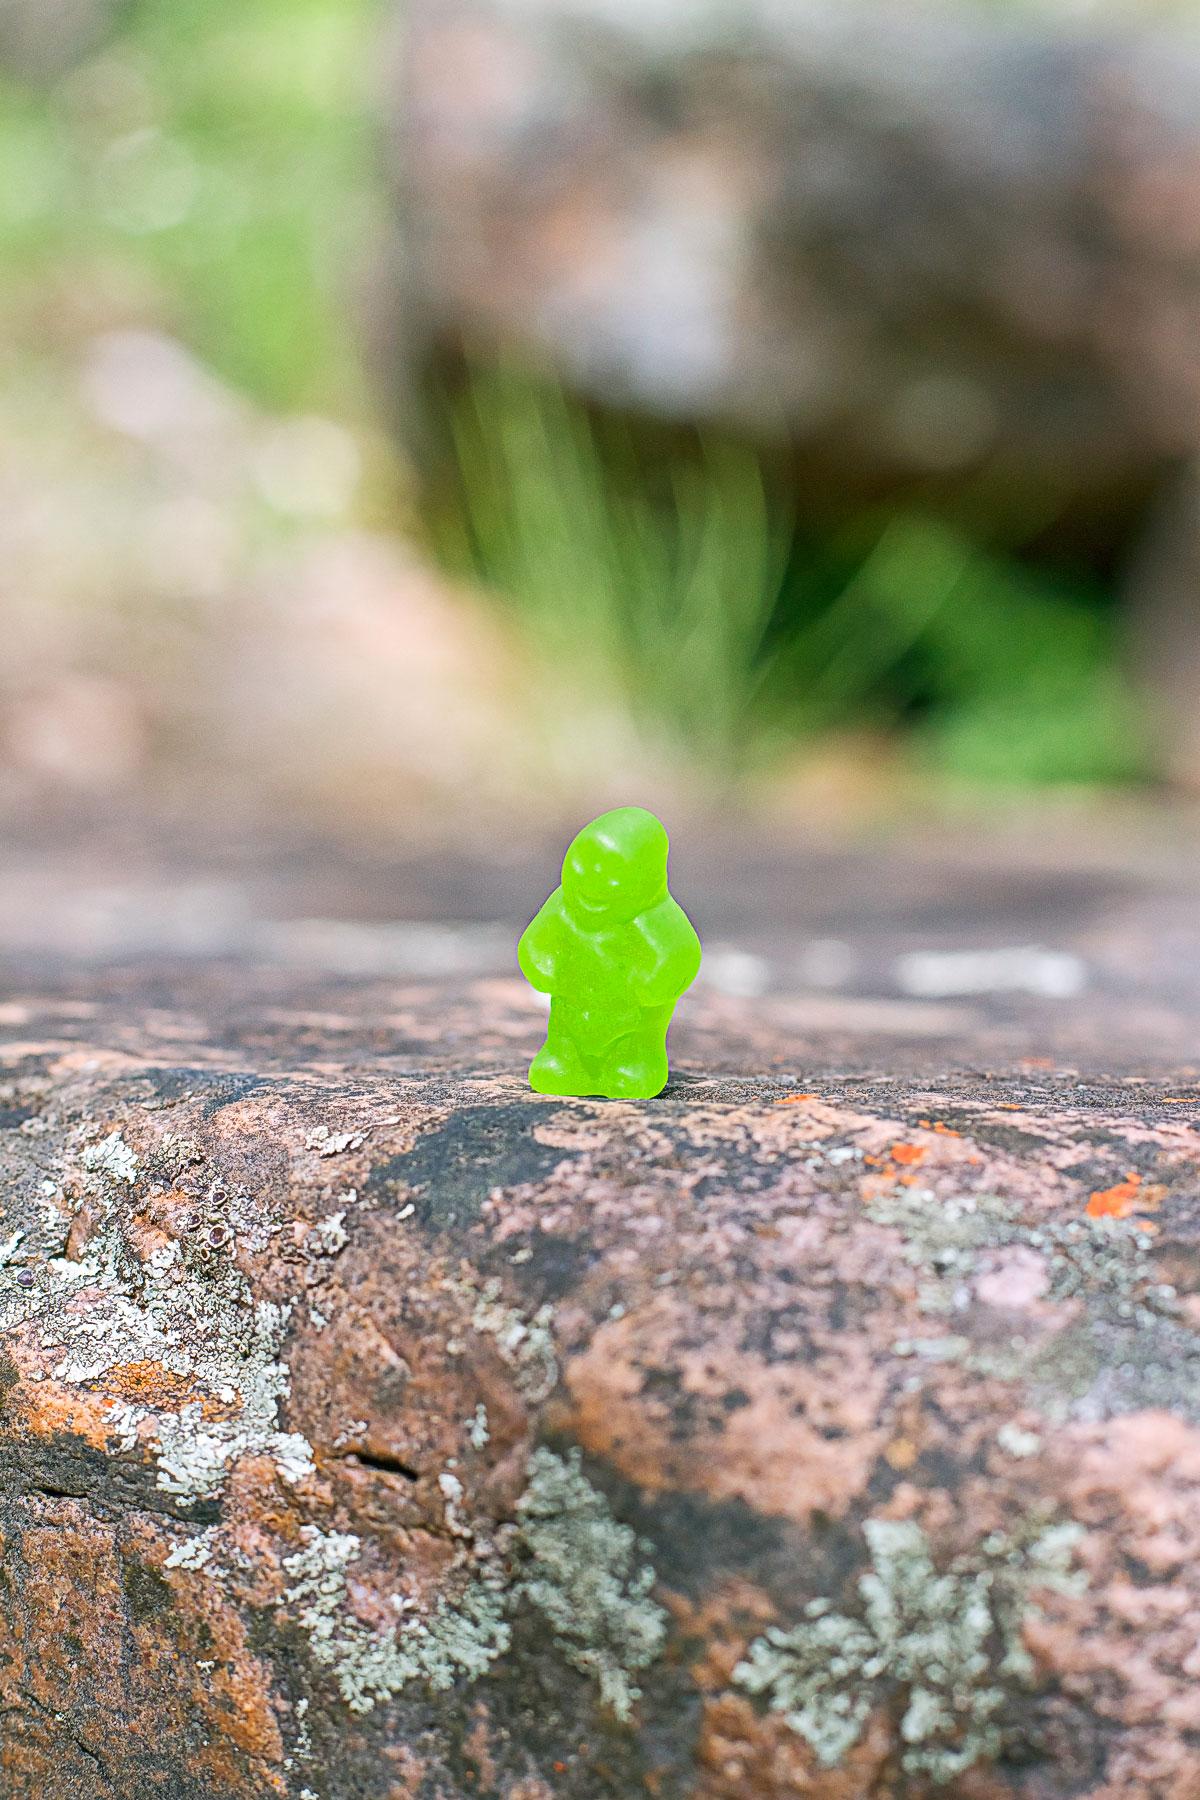 13 Green Jelly Baby on rock.jpg